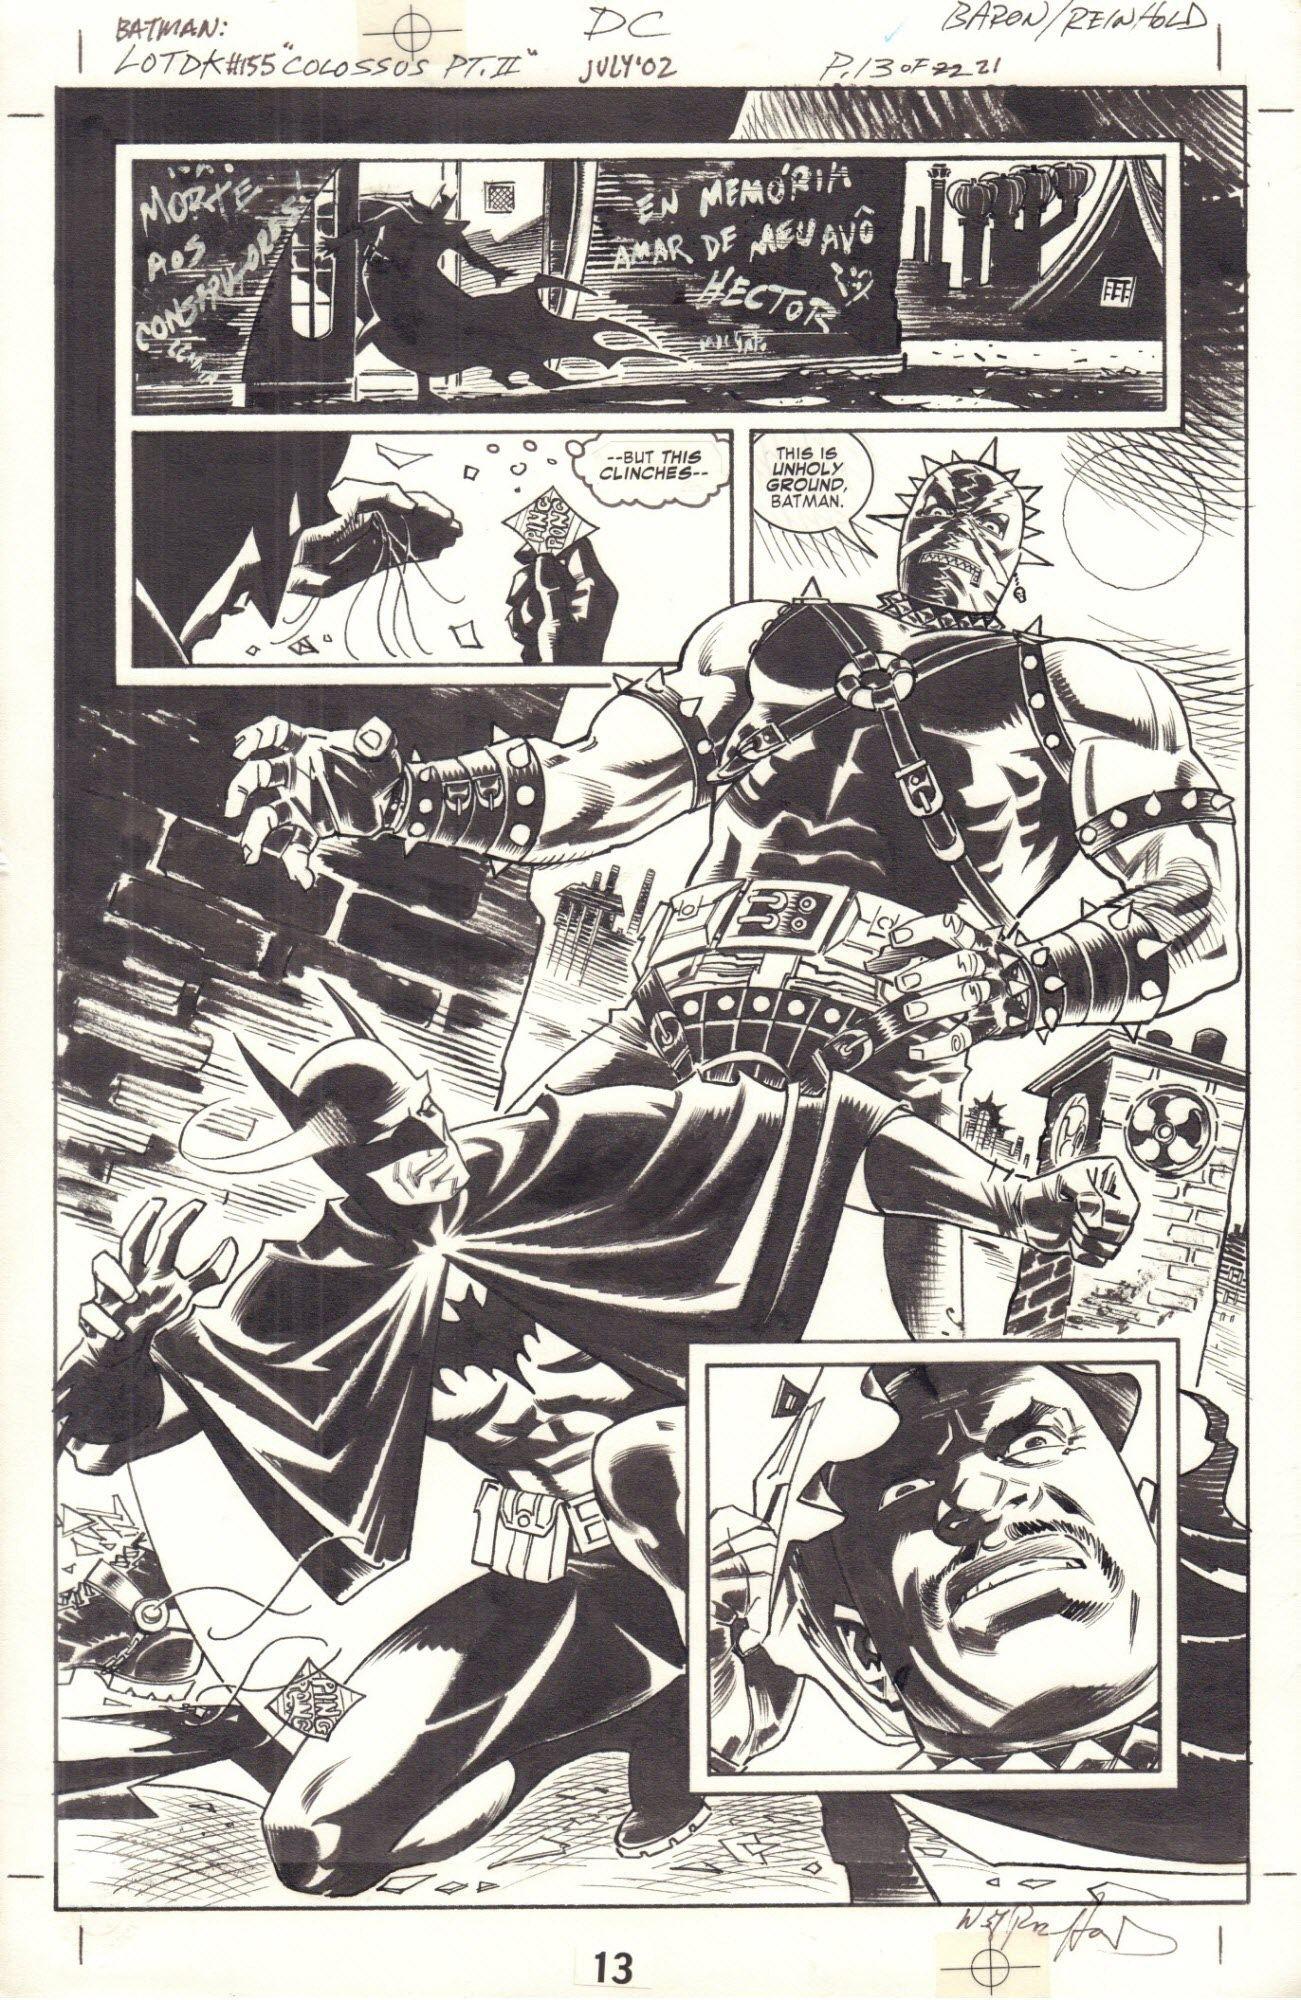 Batman: Legends of the Dark Knight #155 / 13